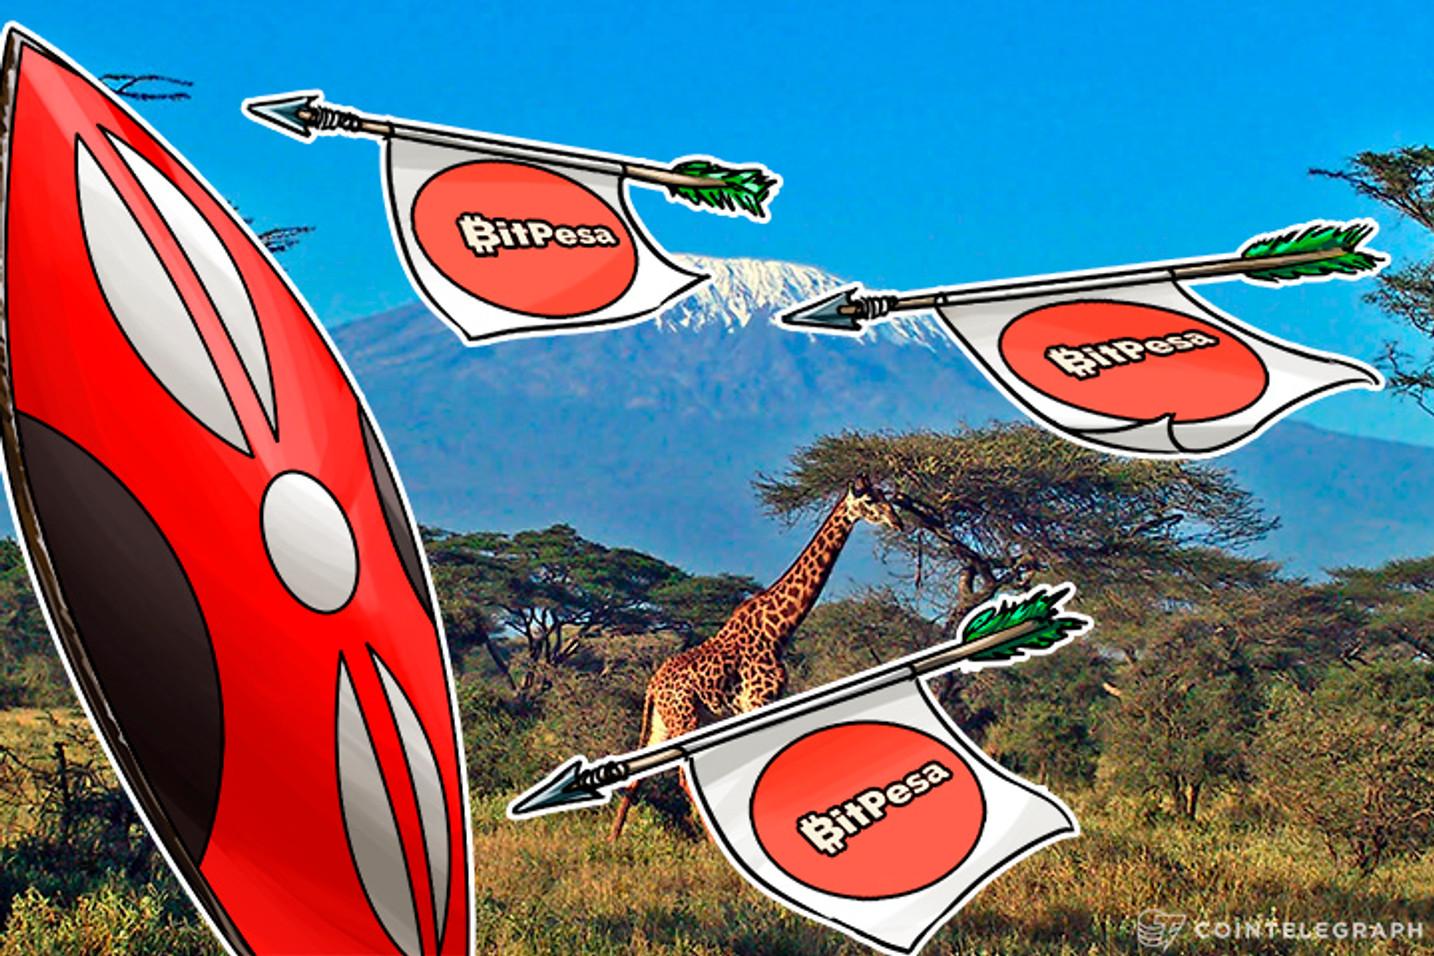 Kenya Shuts Down Bank Accounts of Bitcoin Startups, Minister Can't Sell BitPesa Shares